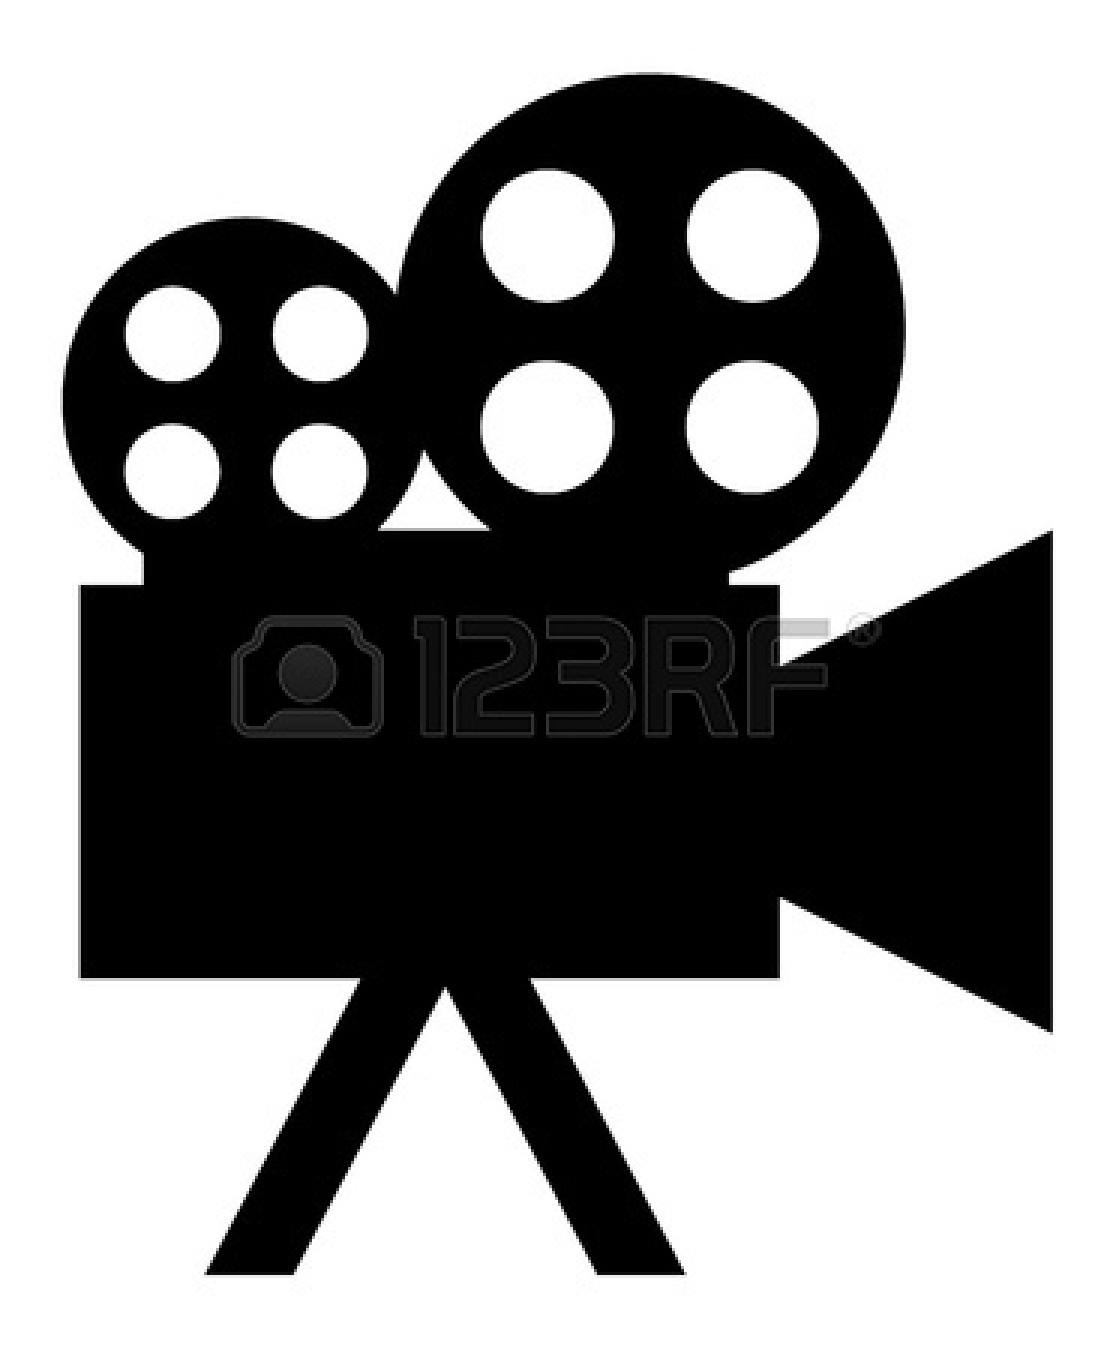 Movie Projector Clipart Clipart Panda Fr-Movie Projector Clipart Clipart Panda Free Clipart Images-18